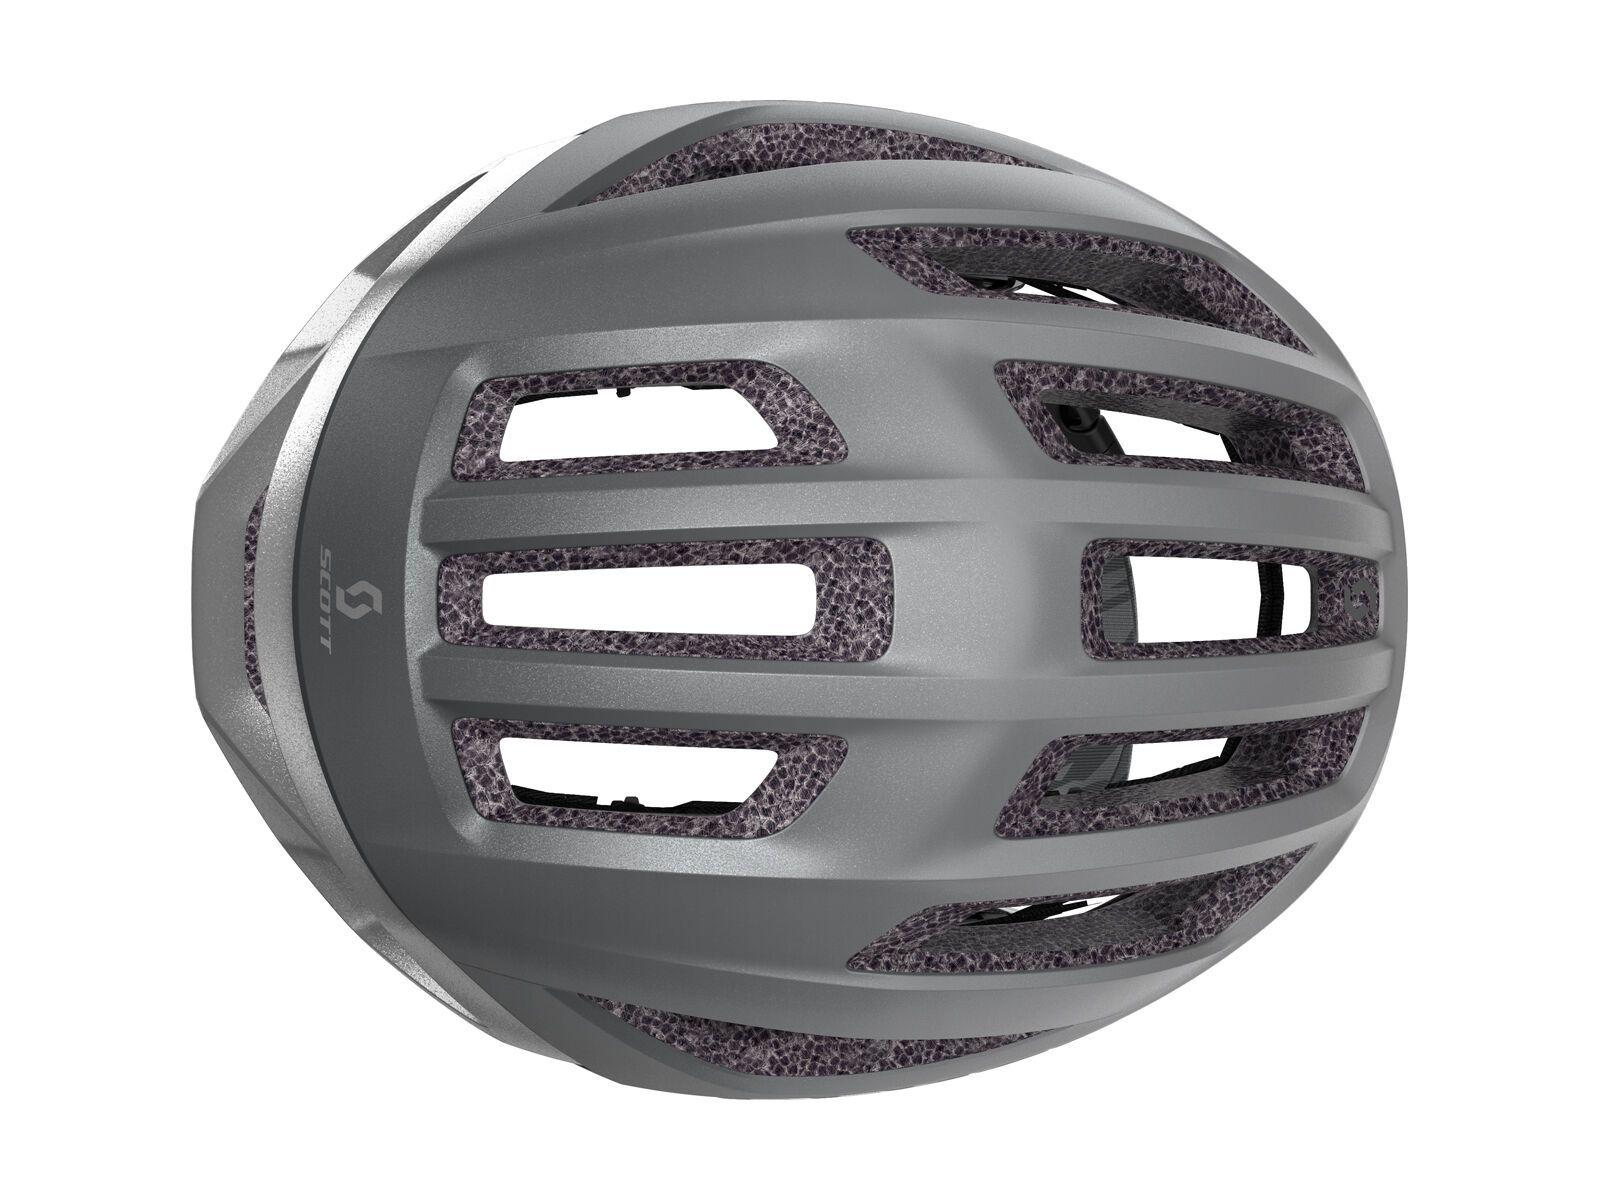 Scott Centric Plus Helmet, vogue silver/reflective | Bild 4